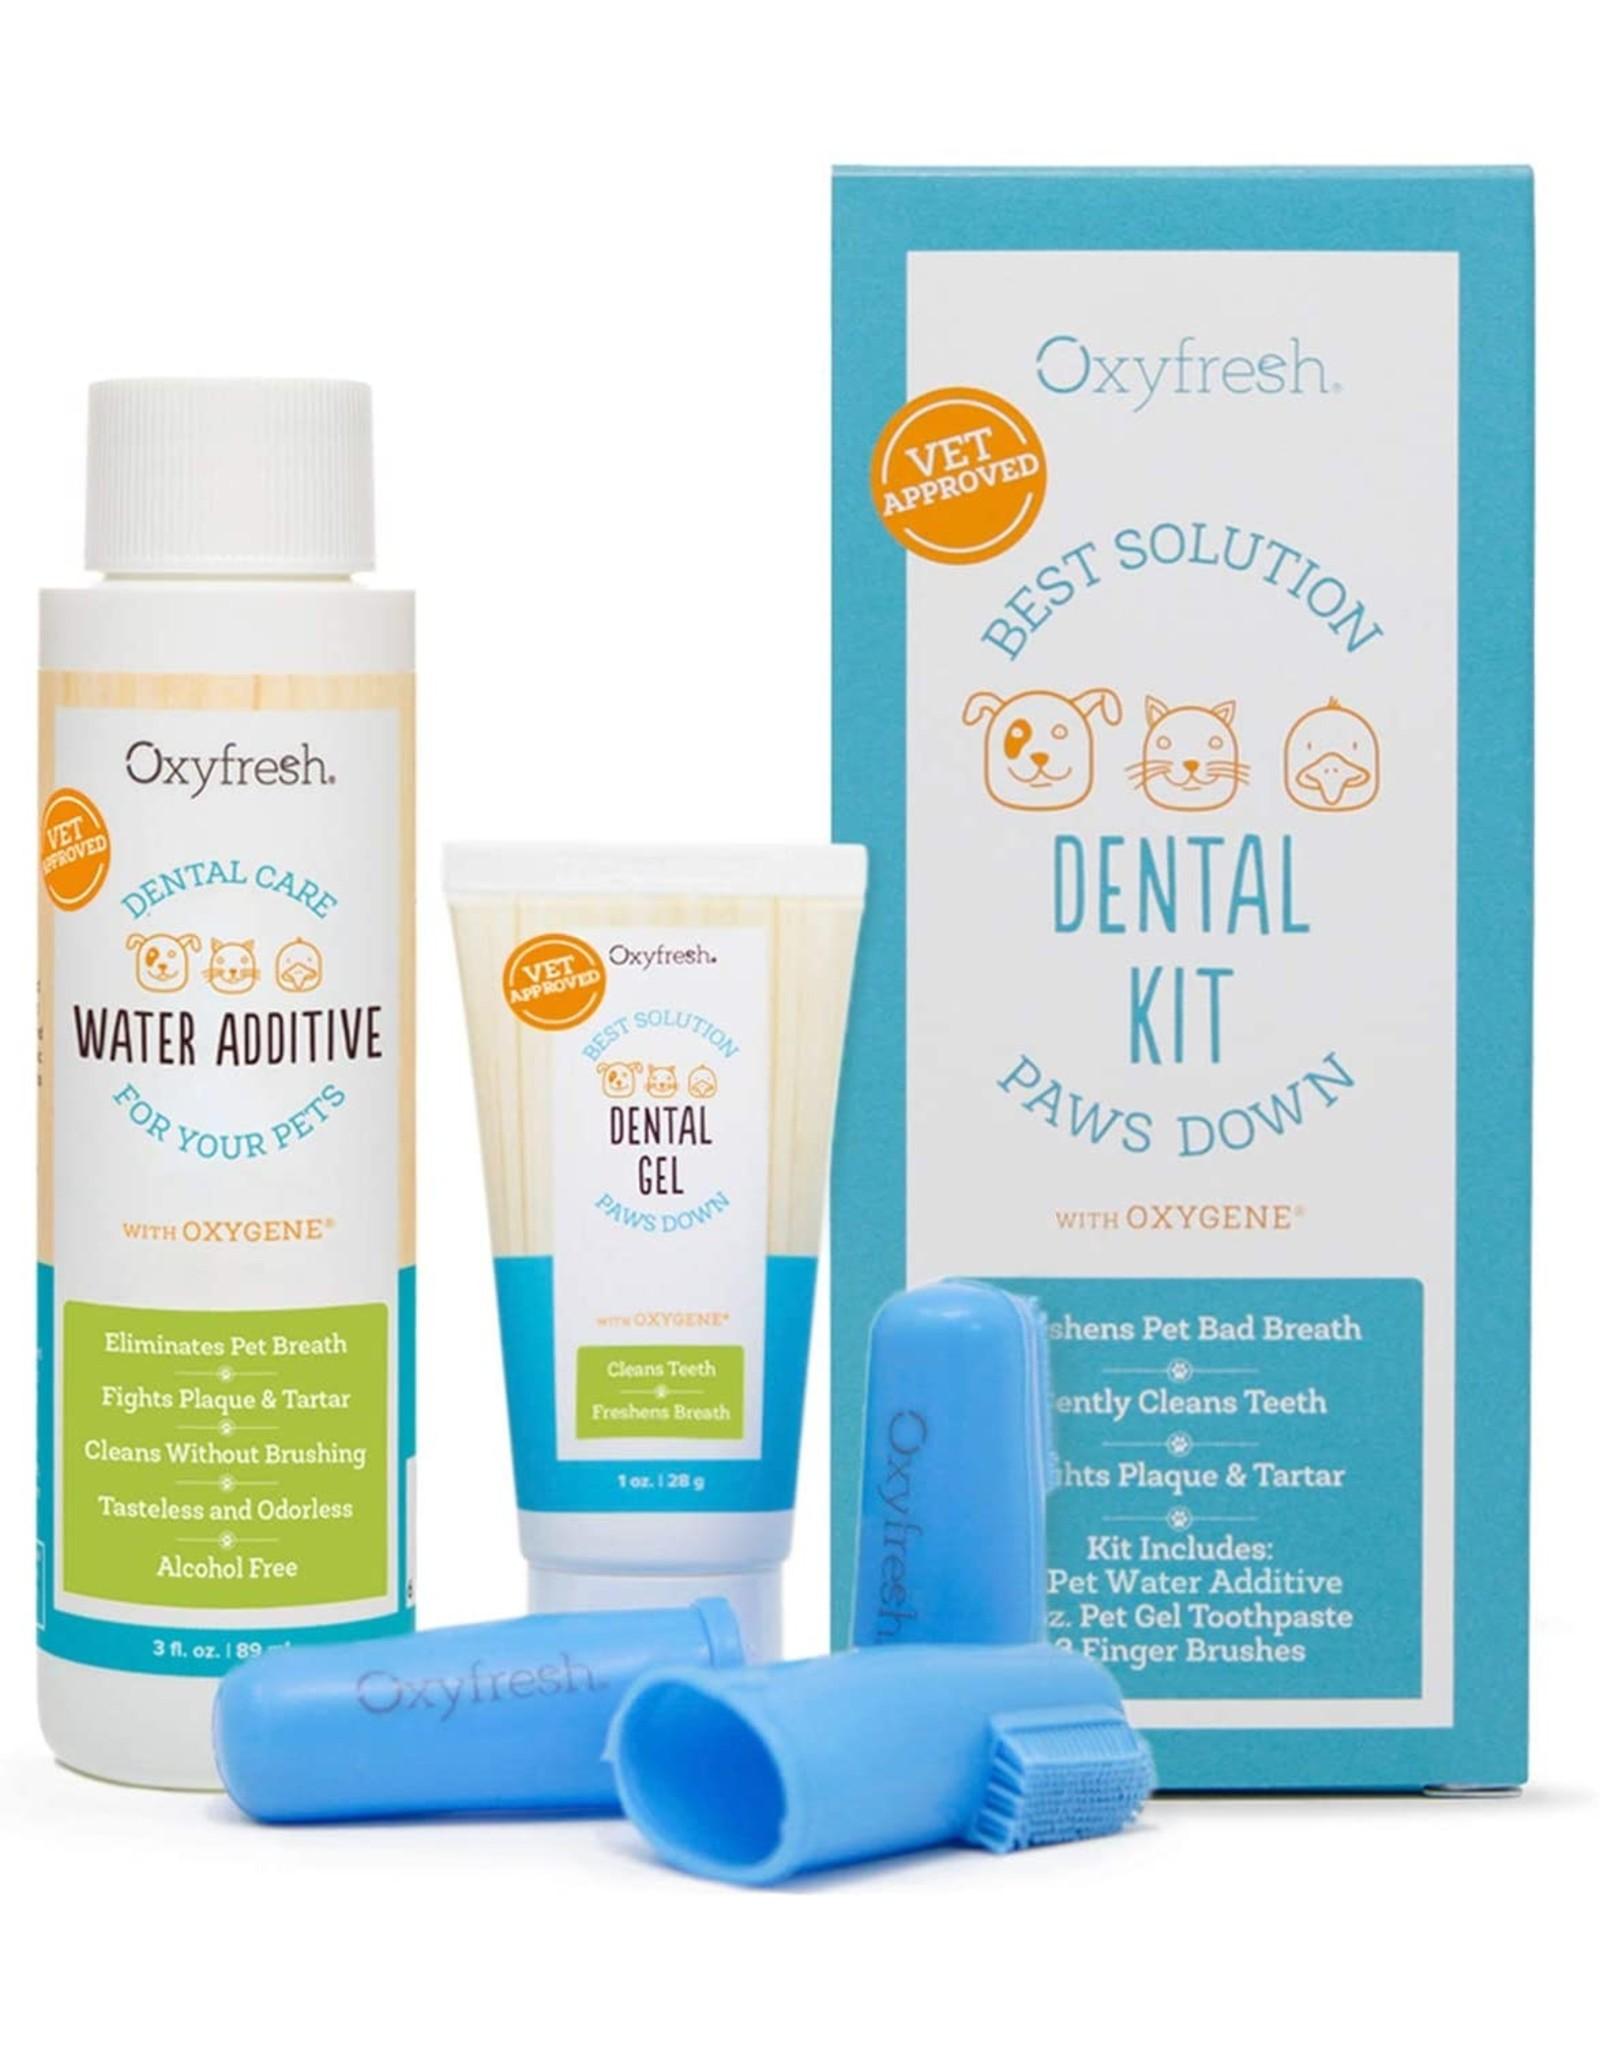 OxyFresh OxyFresh Dental Kit for Dogs & Cats